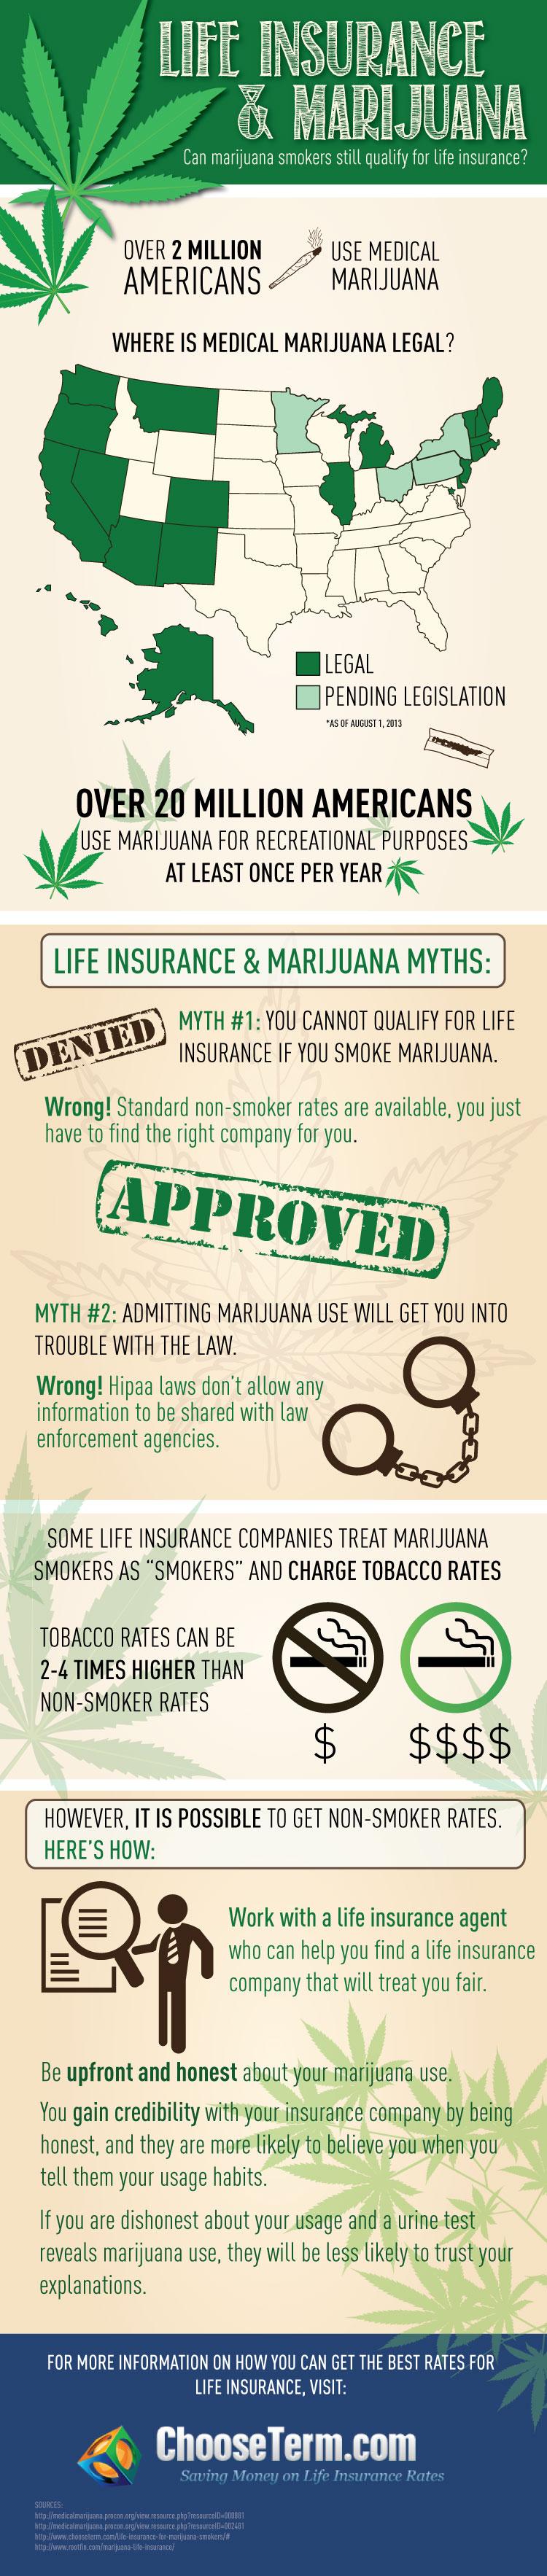 life-insurance--marijuana